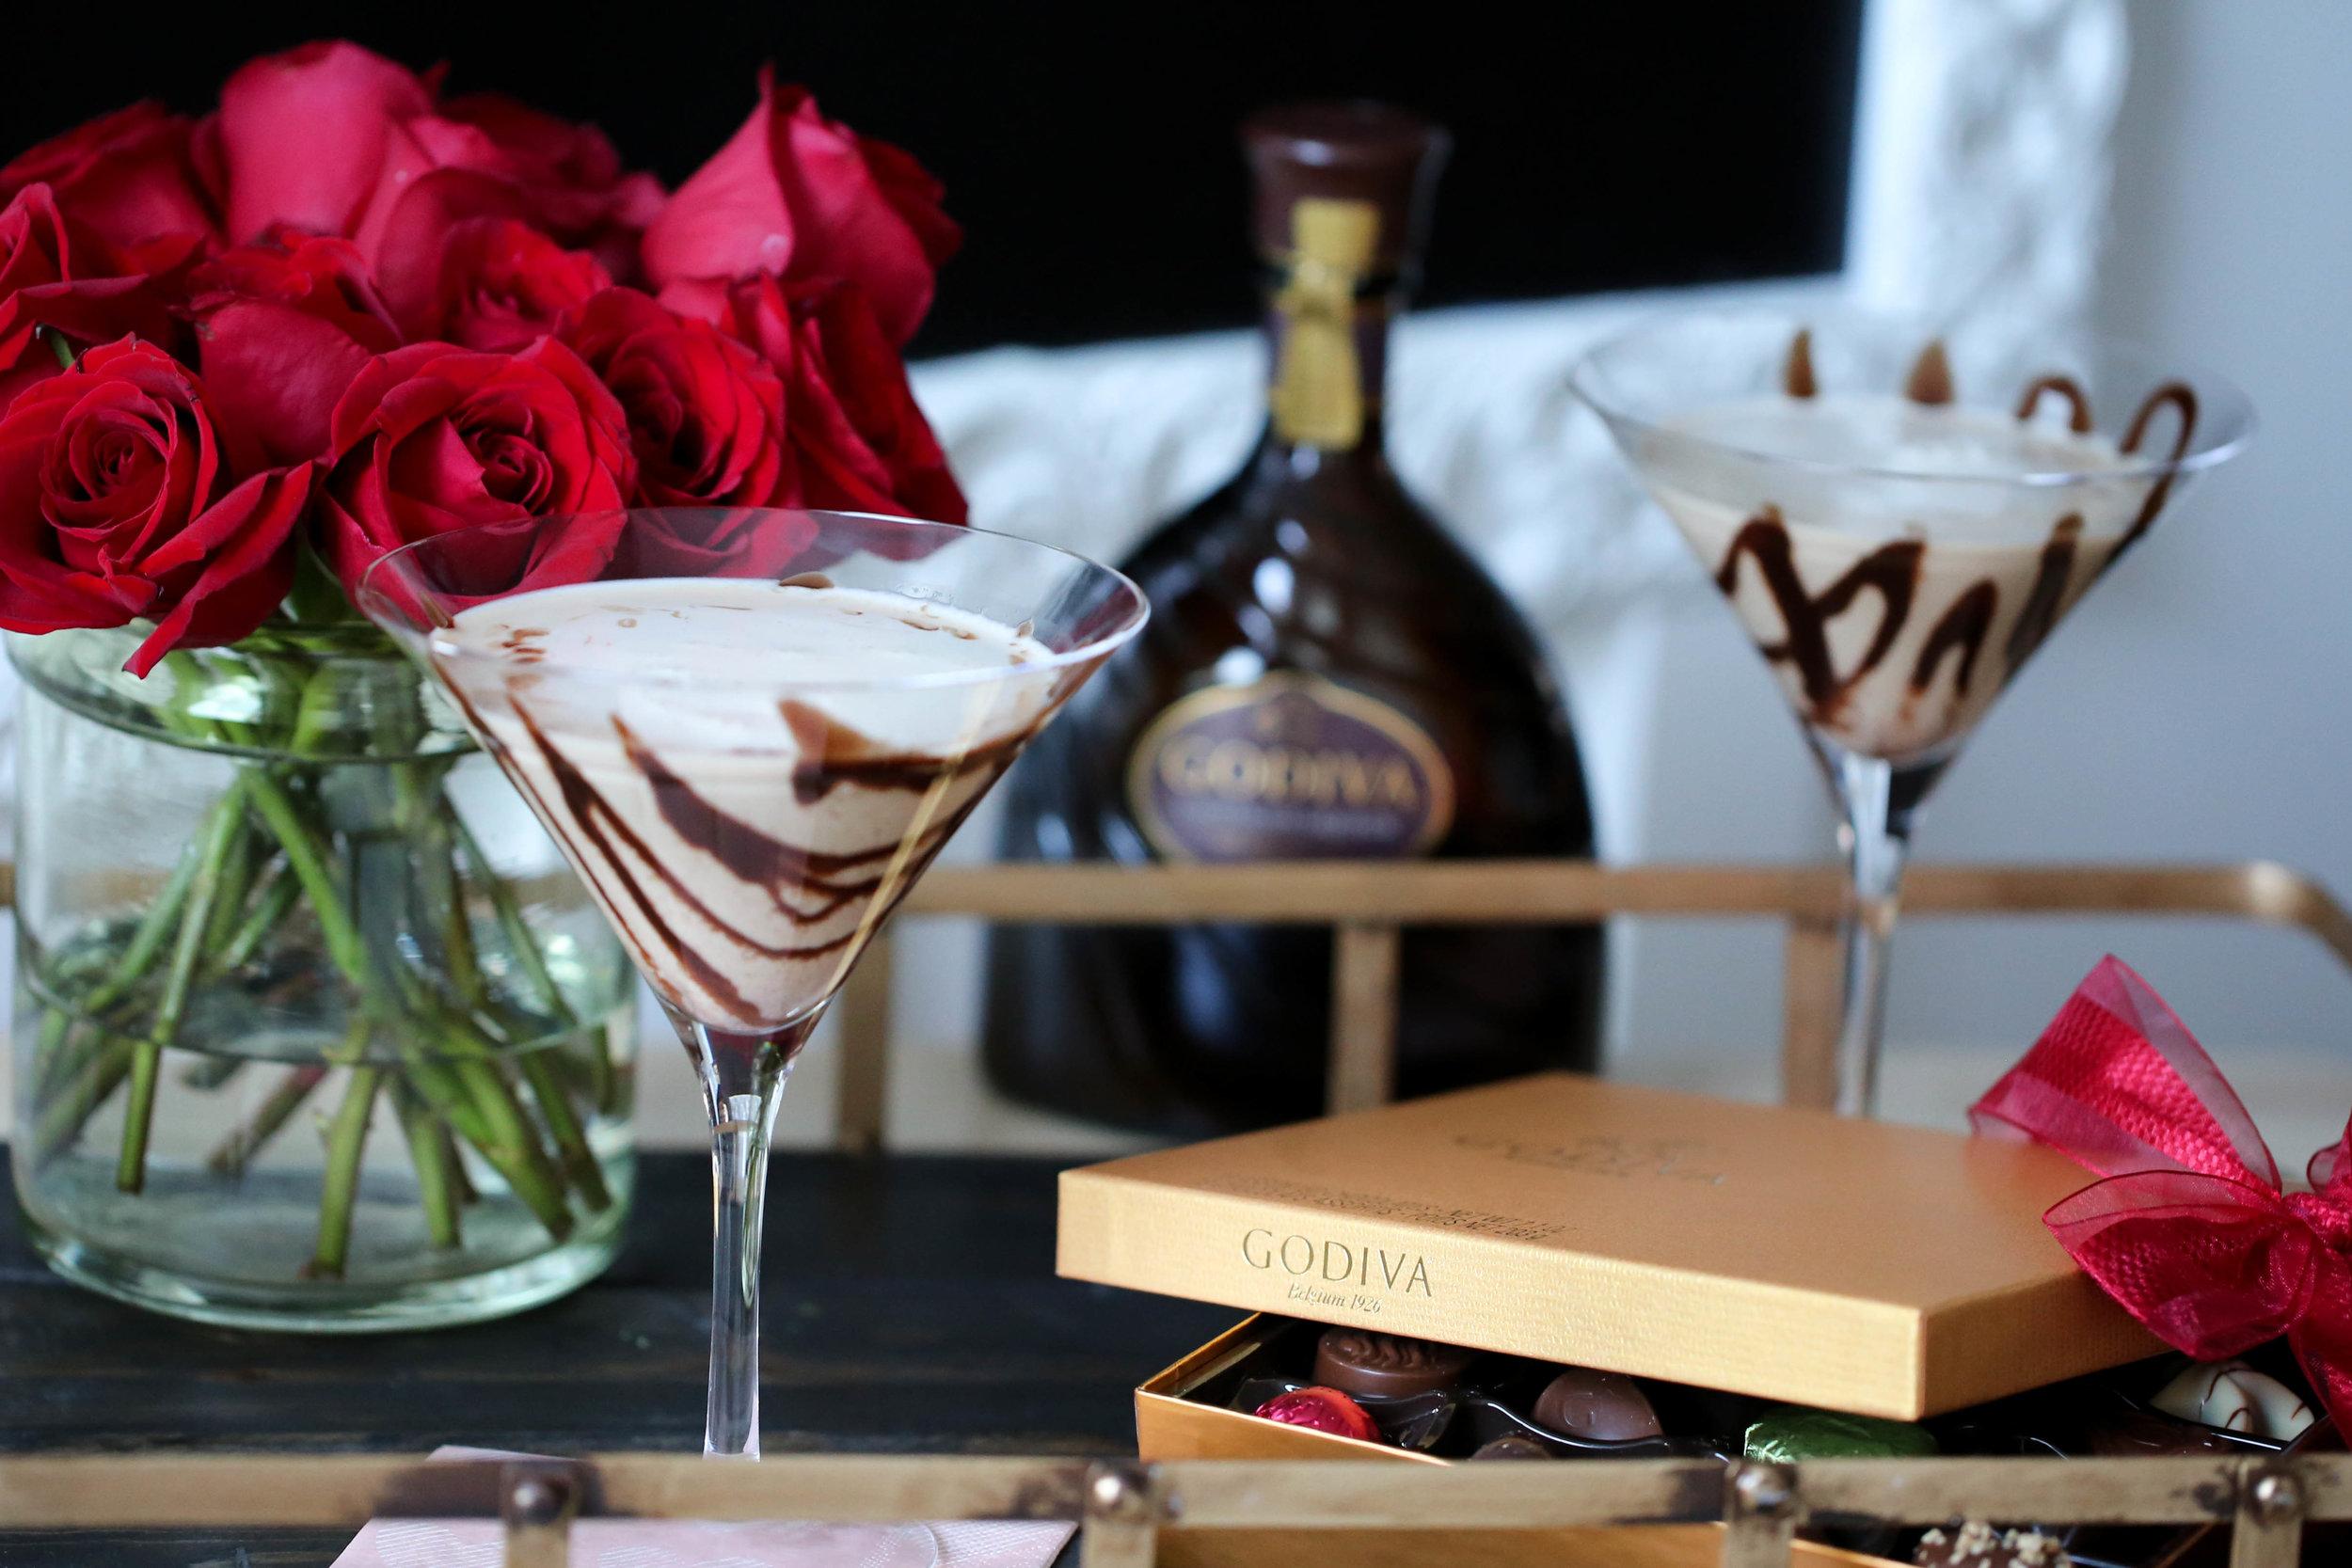 godiva, chocolates, martinis, chocolate martinis